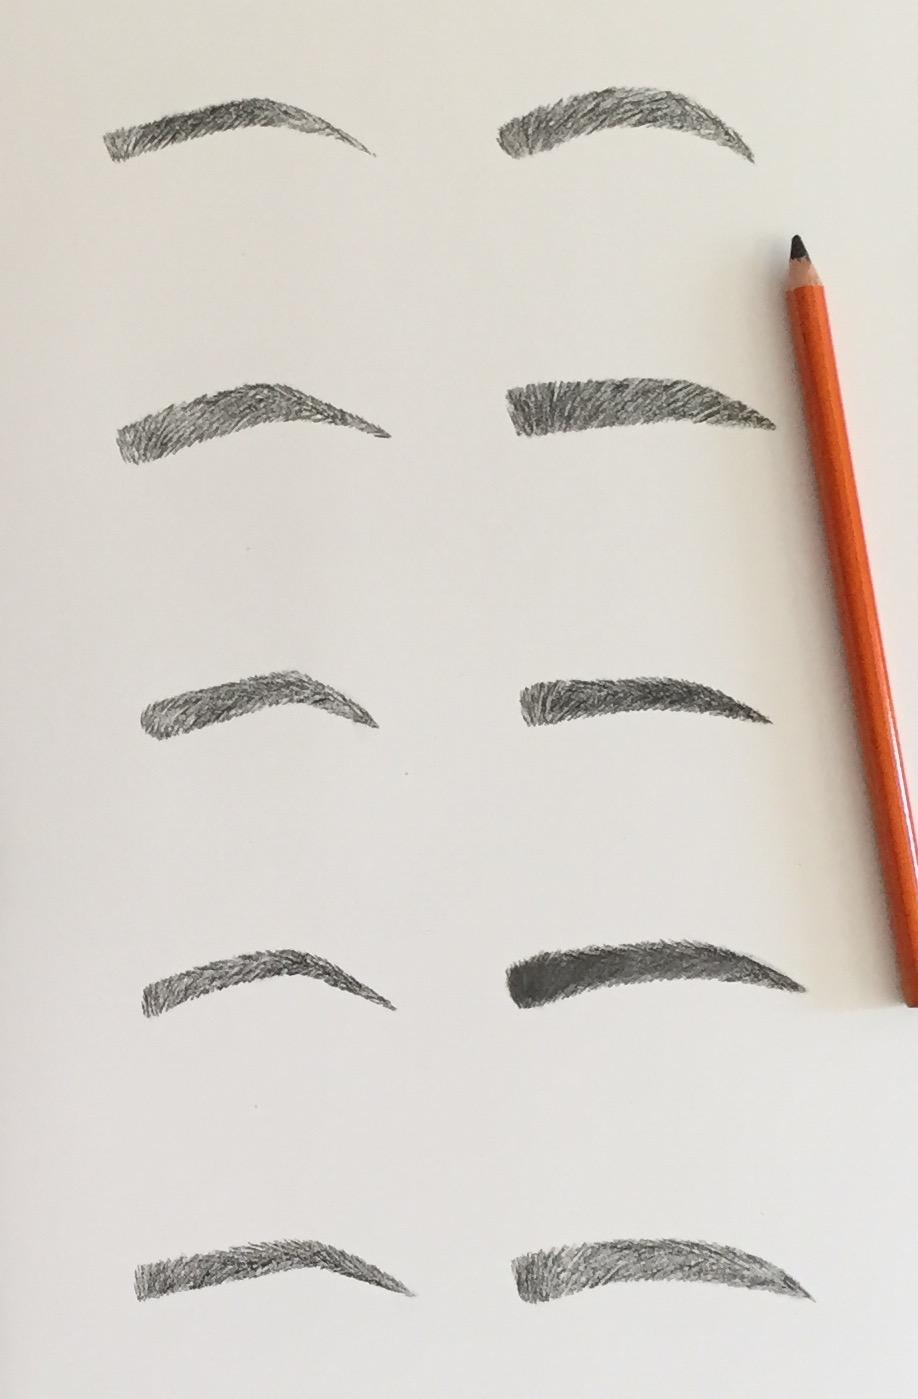 Dr-Jason-Champagne-Beverly-Hills-Plastic-Surgery-Custom-Eyebrow-Hair-Transplatation-Drawings.jpg